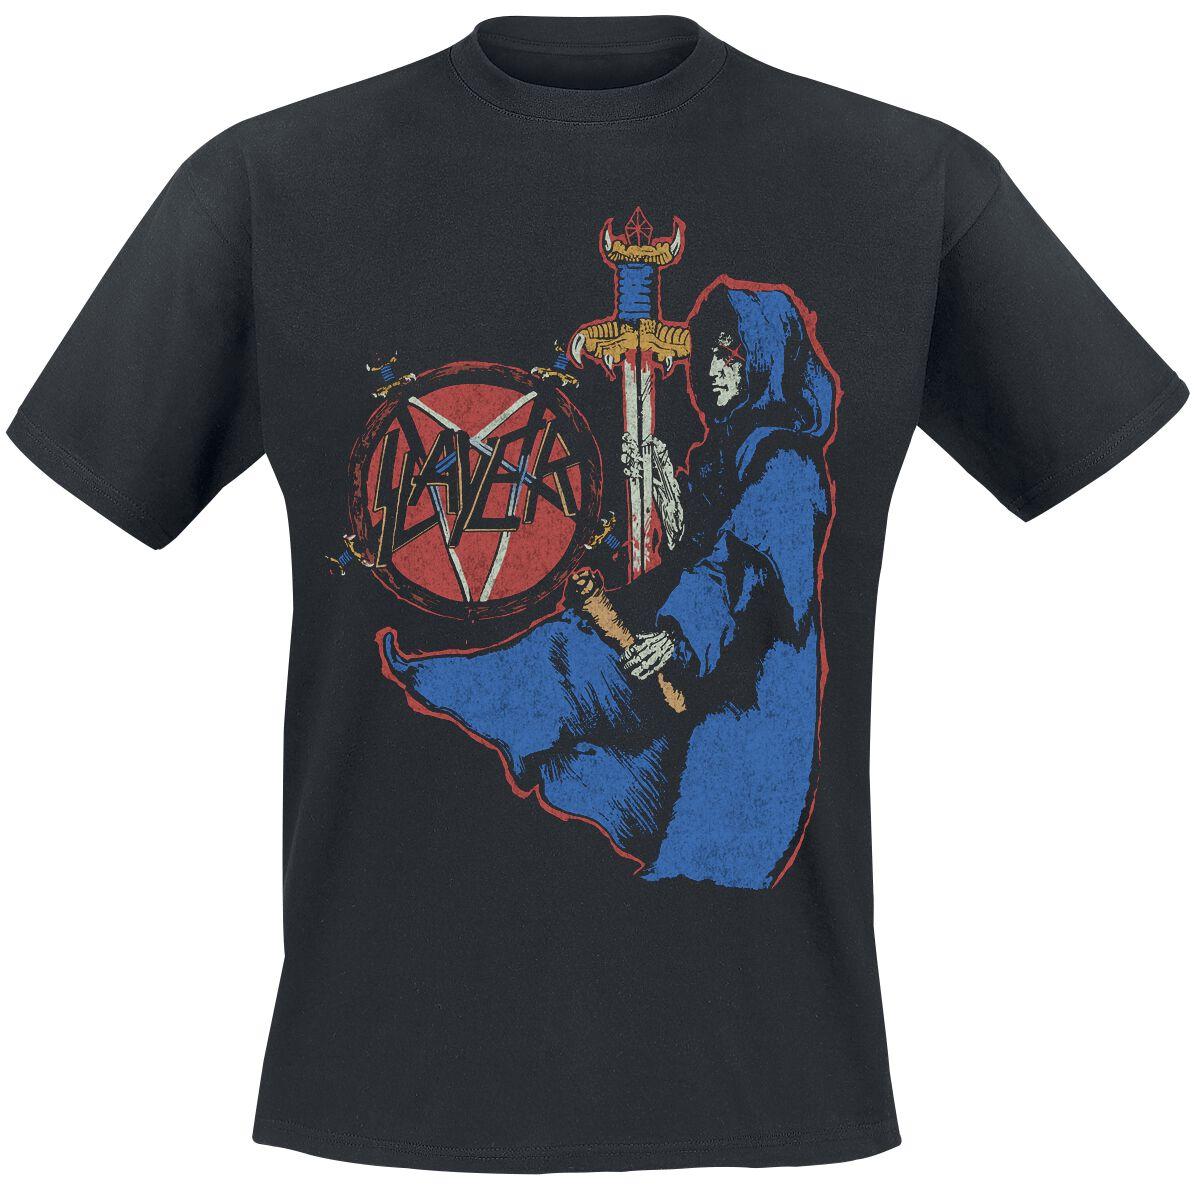 Image of   Slayer Spill The Blood T-Shirt sort